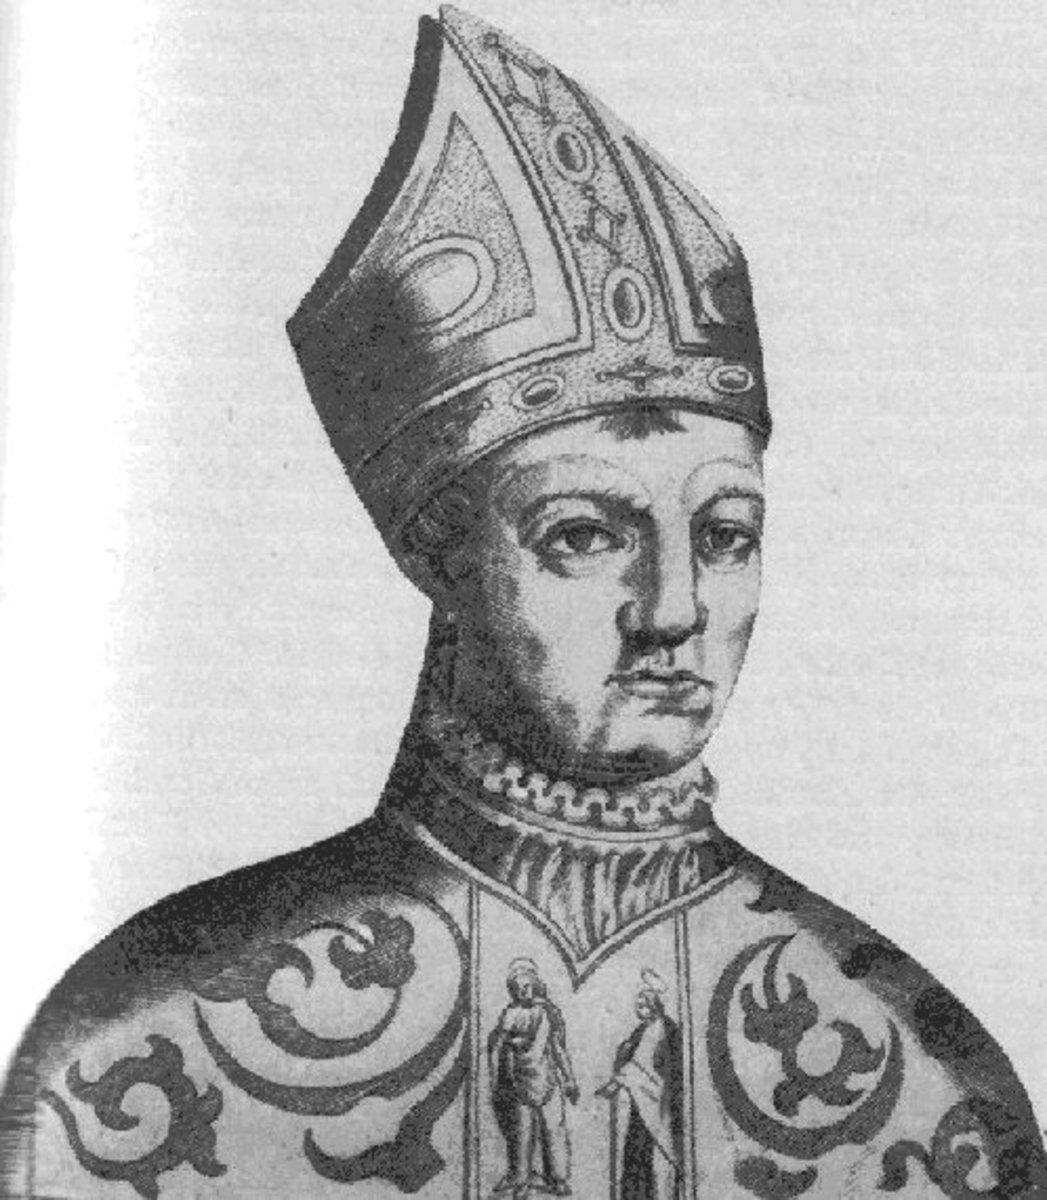 POPE JOHN XXIII (1410-1415)